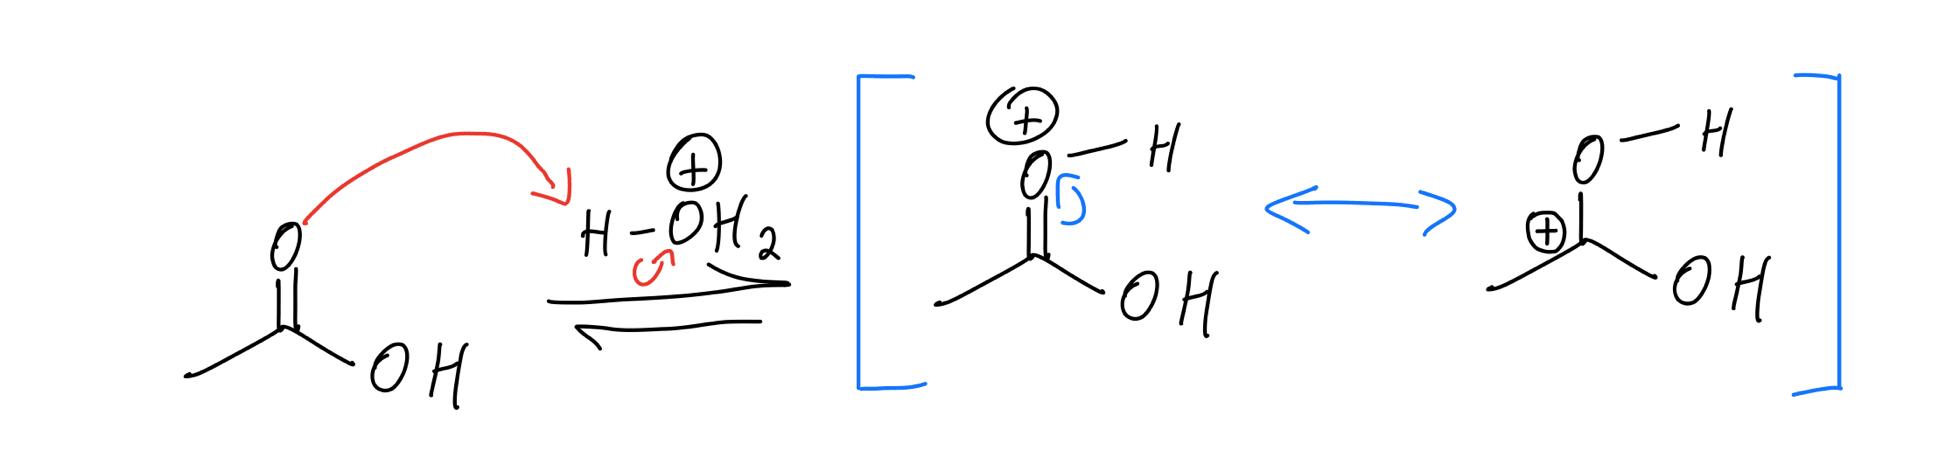 protonation